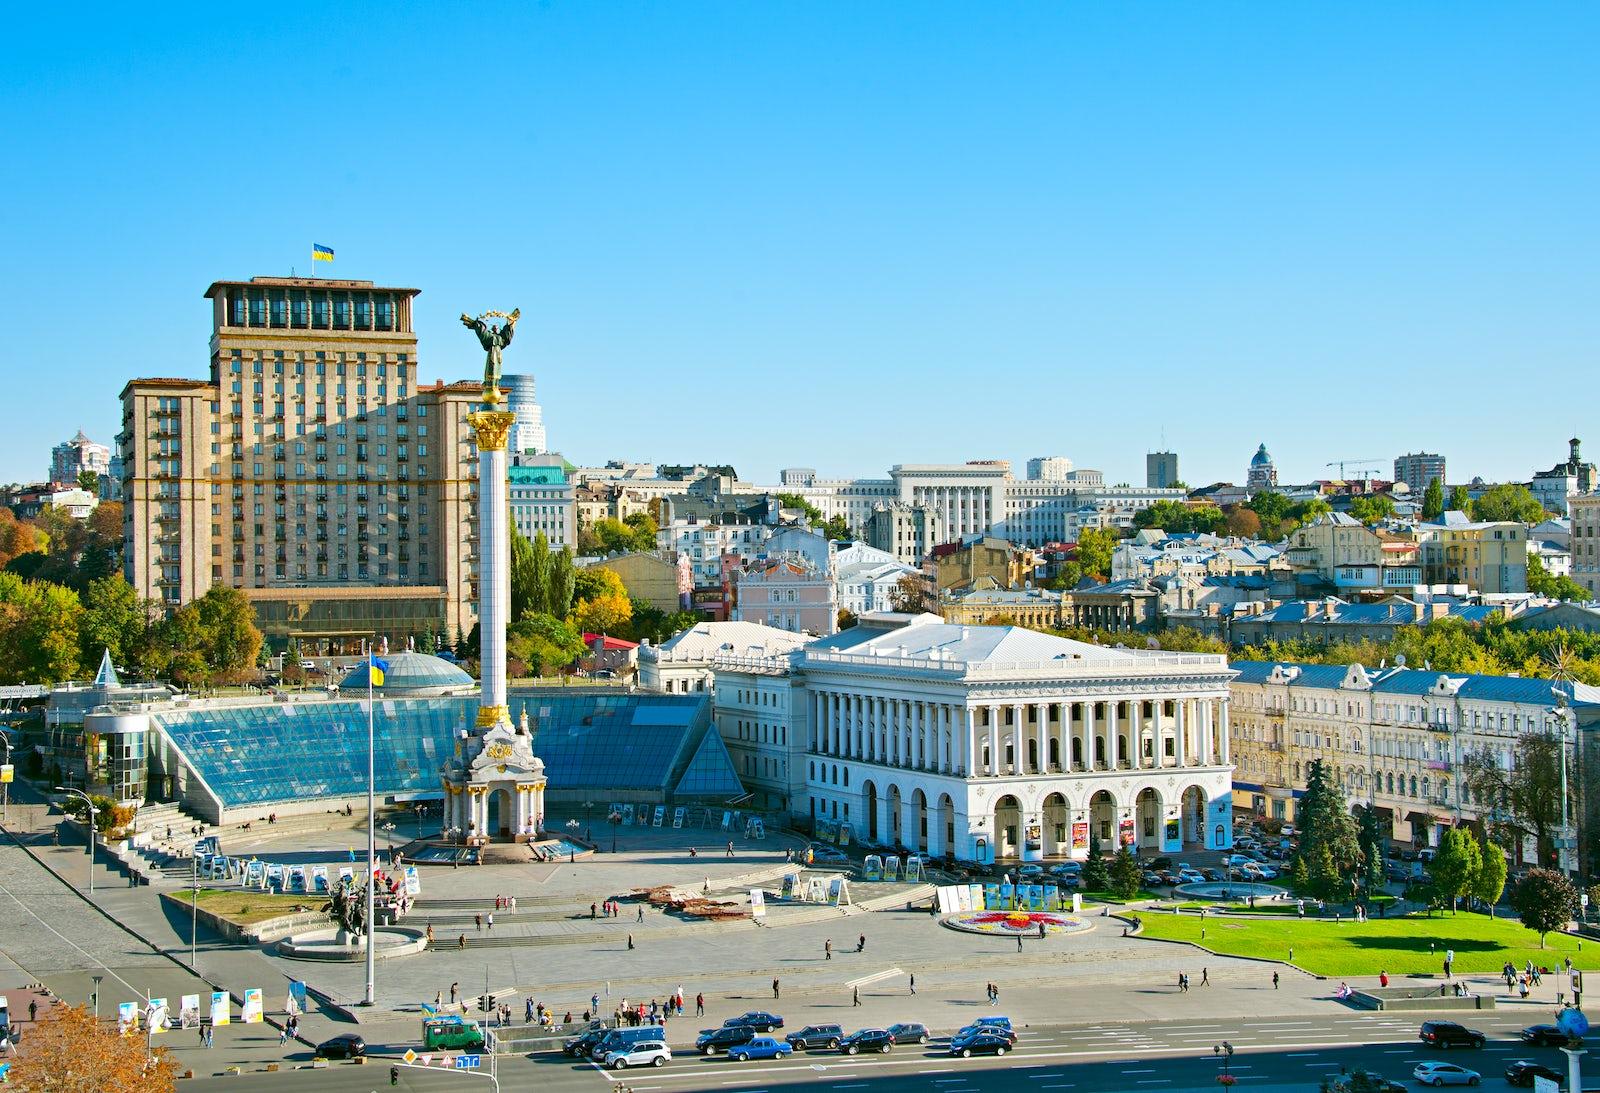 !i18n:en:data.cities:kyiv.picture.caption